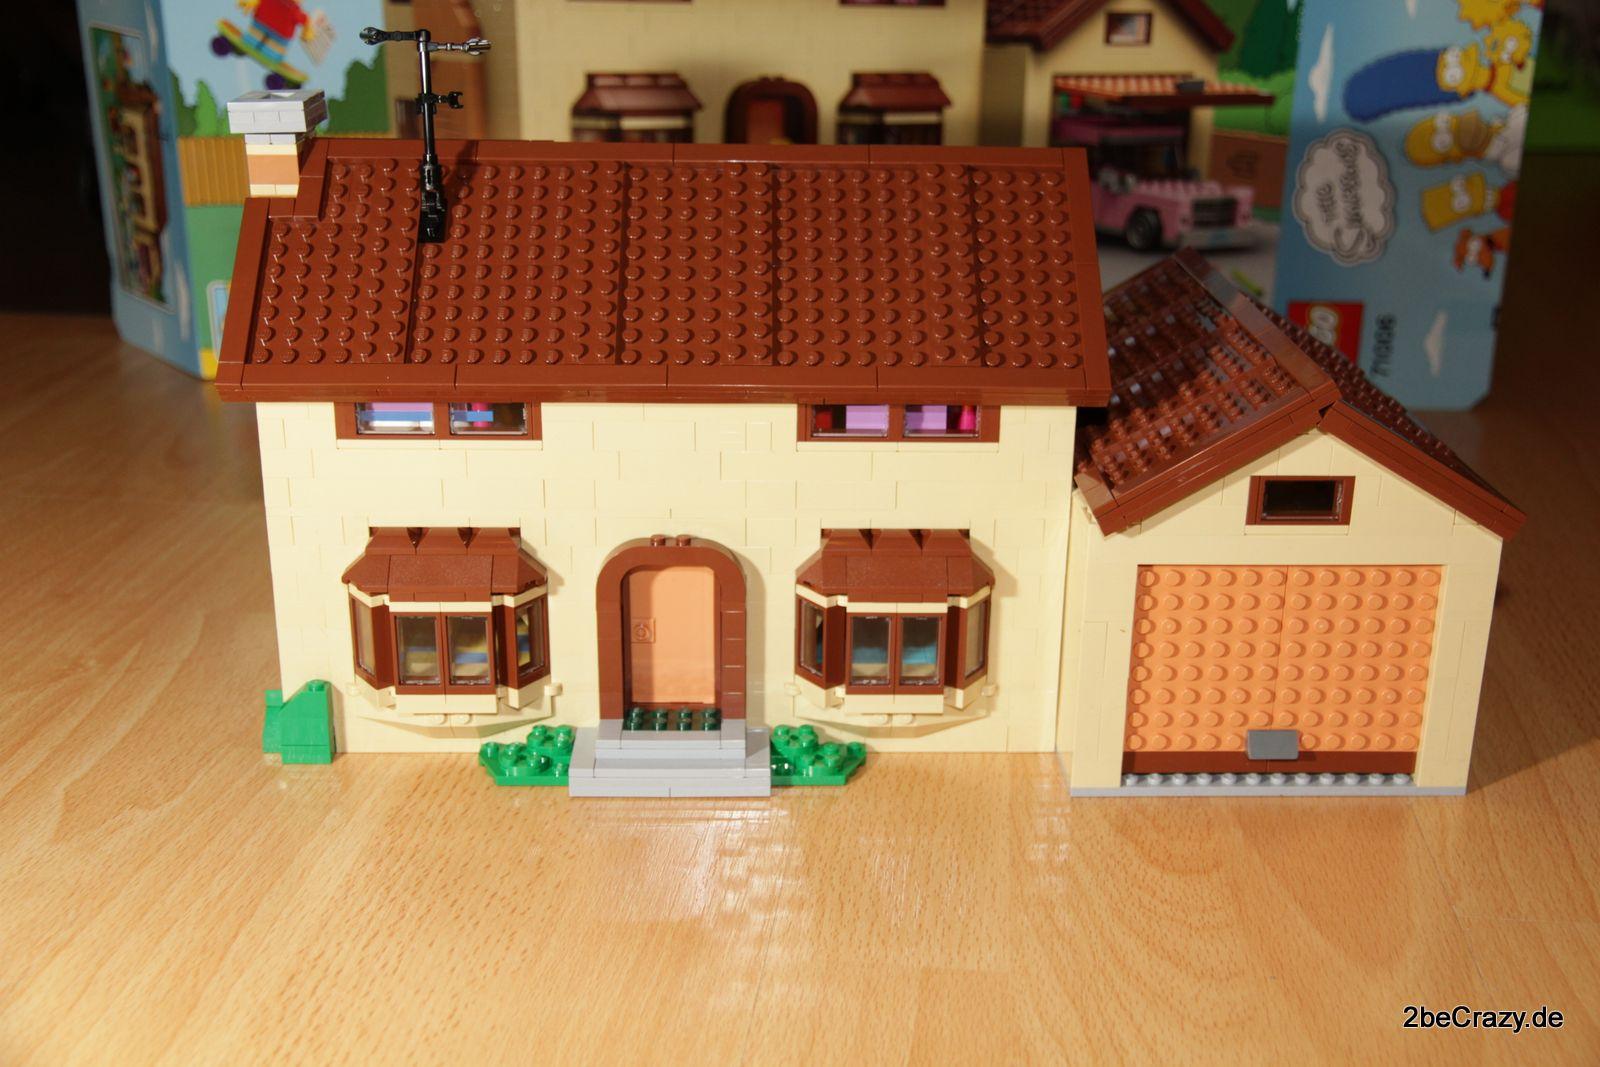 Simpsons Haus Lego 79 187 2becrazy